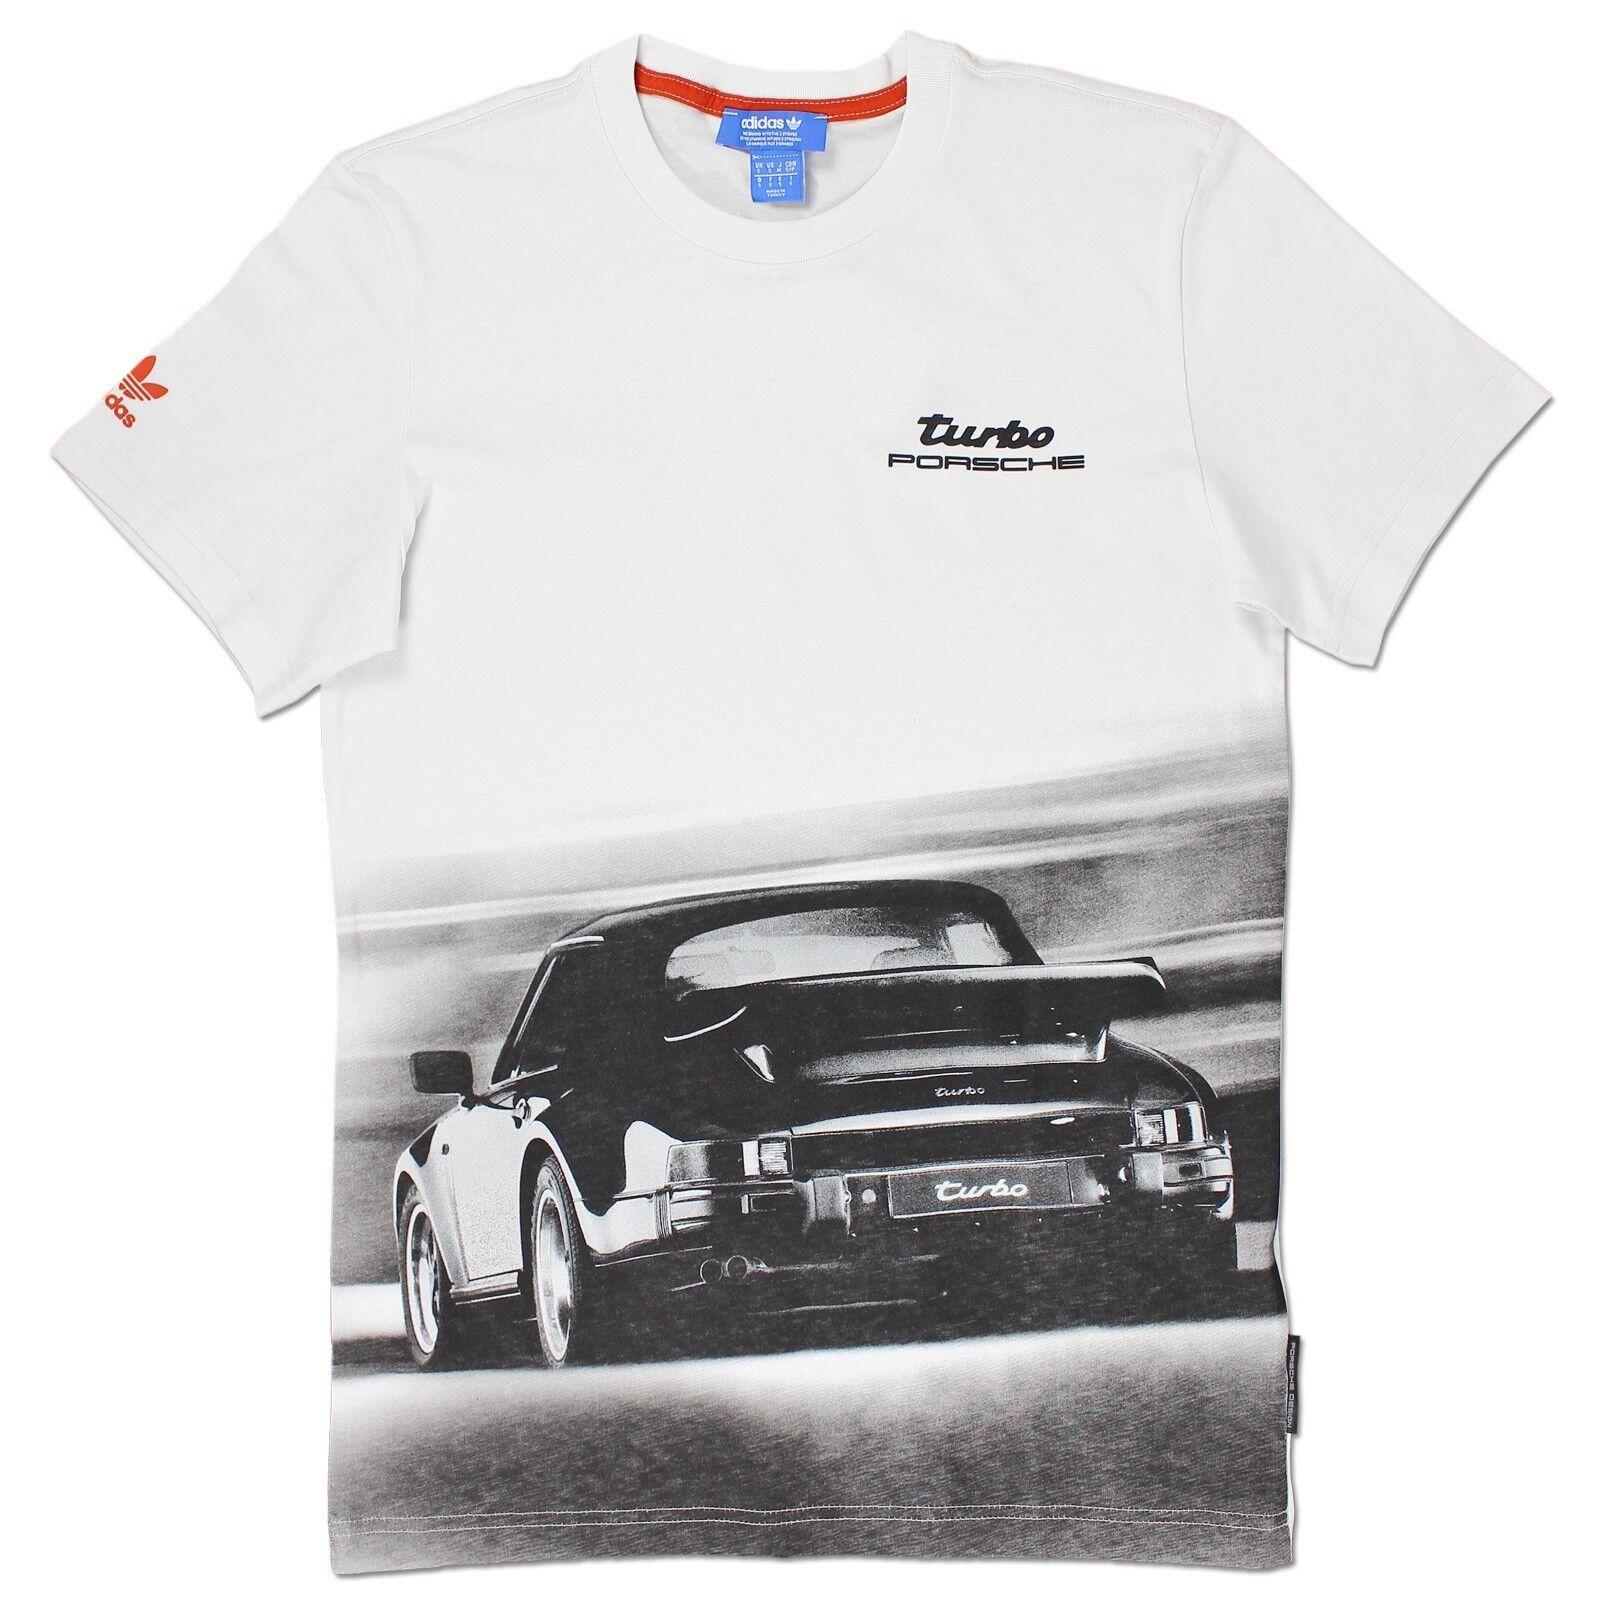 ADIDAS Originals Uomo Porsche 911 Turbo Design Tee Shirt Bianco Vintage S-XXL